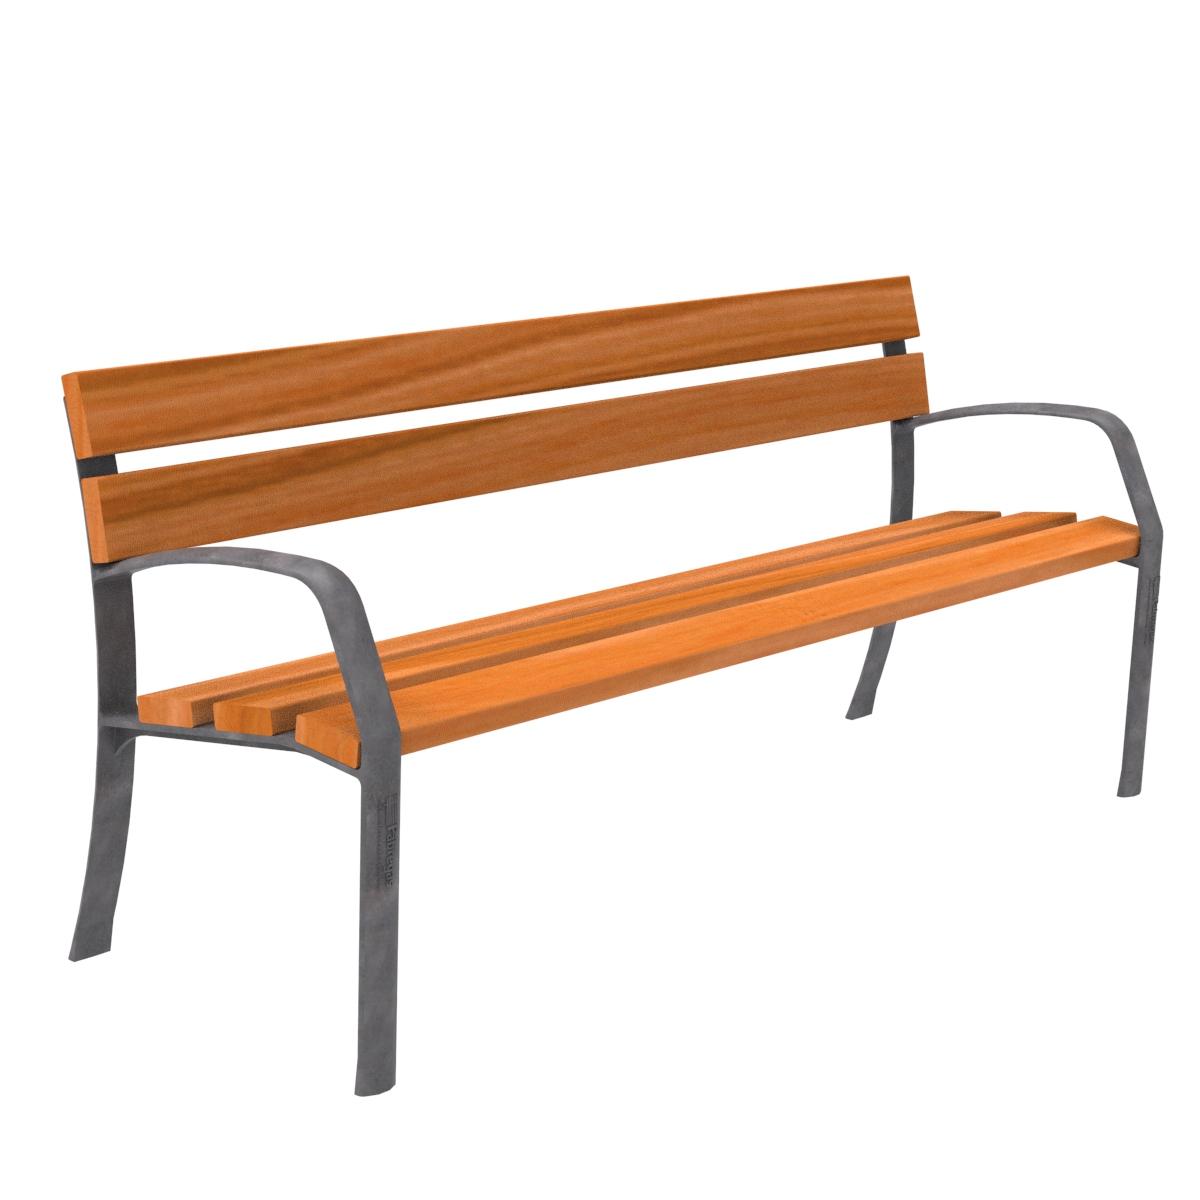 Banco madera similar mobiliario elemento urbano parques y for Columpio de terraza homecenter